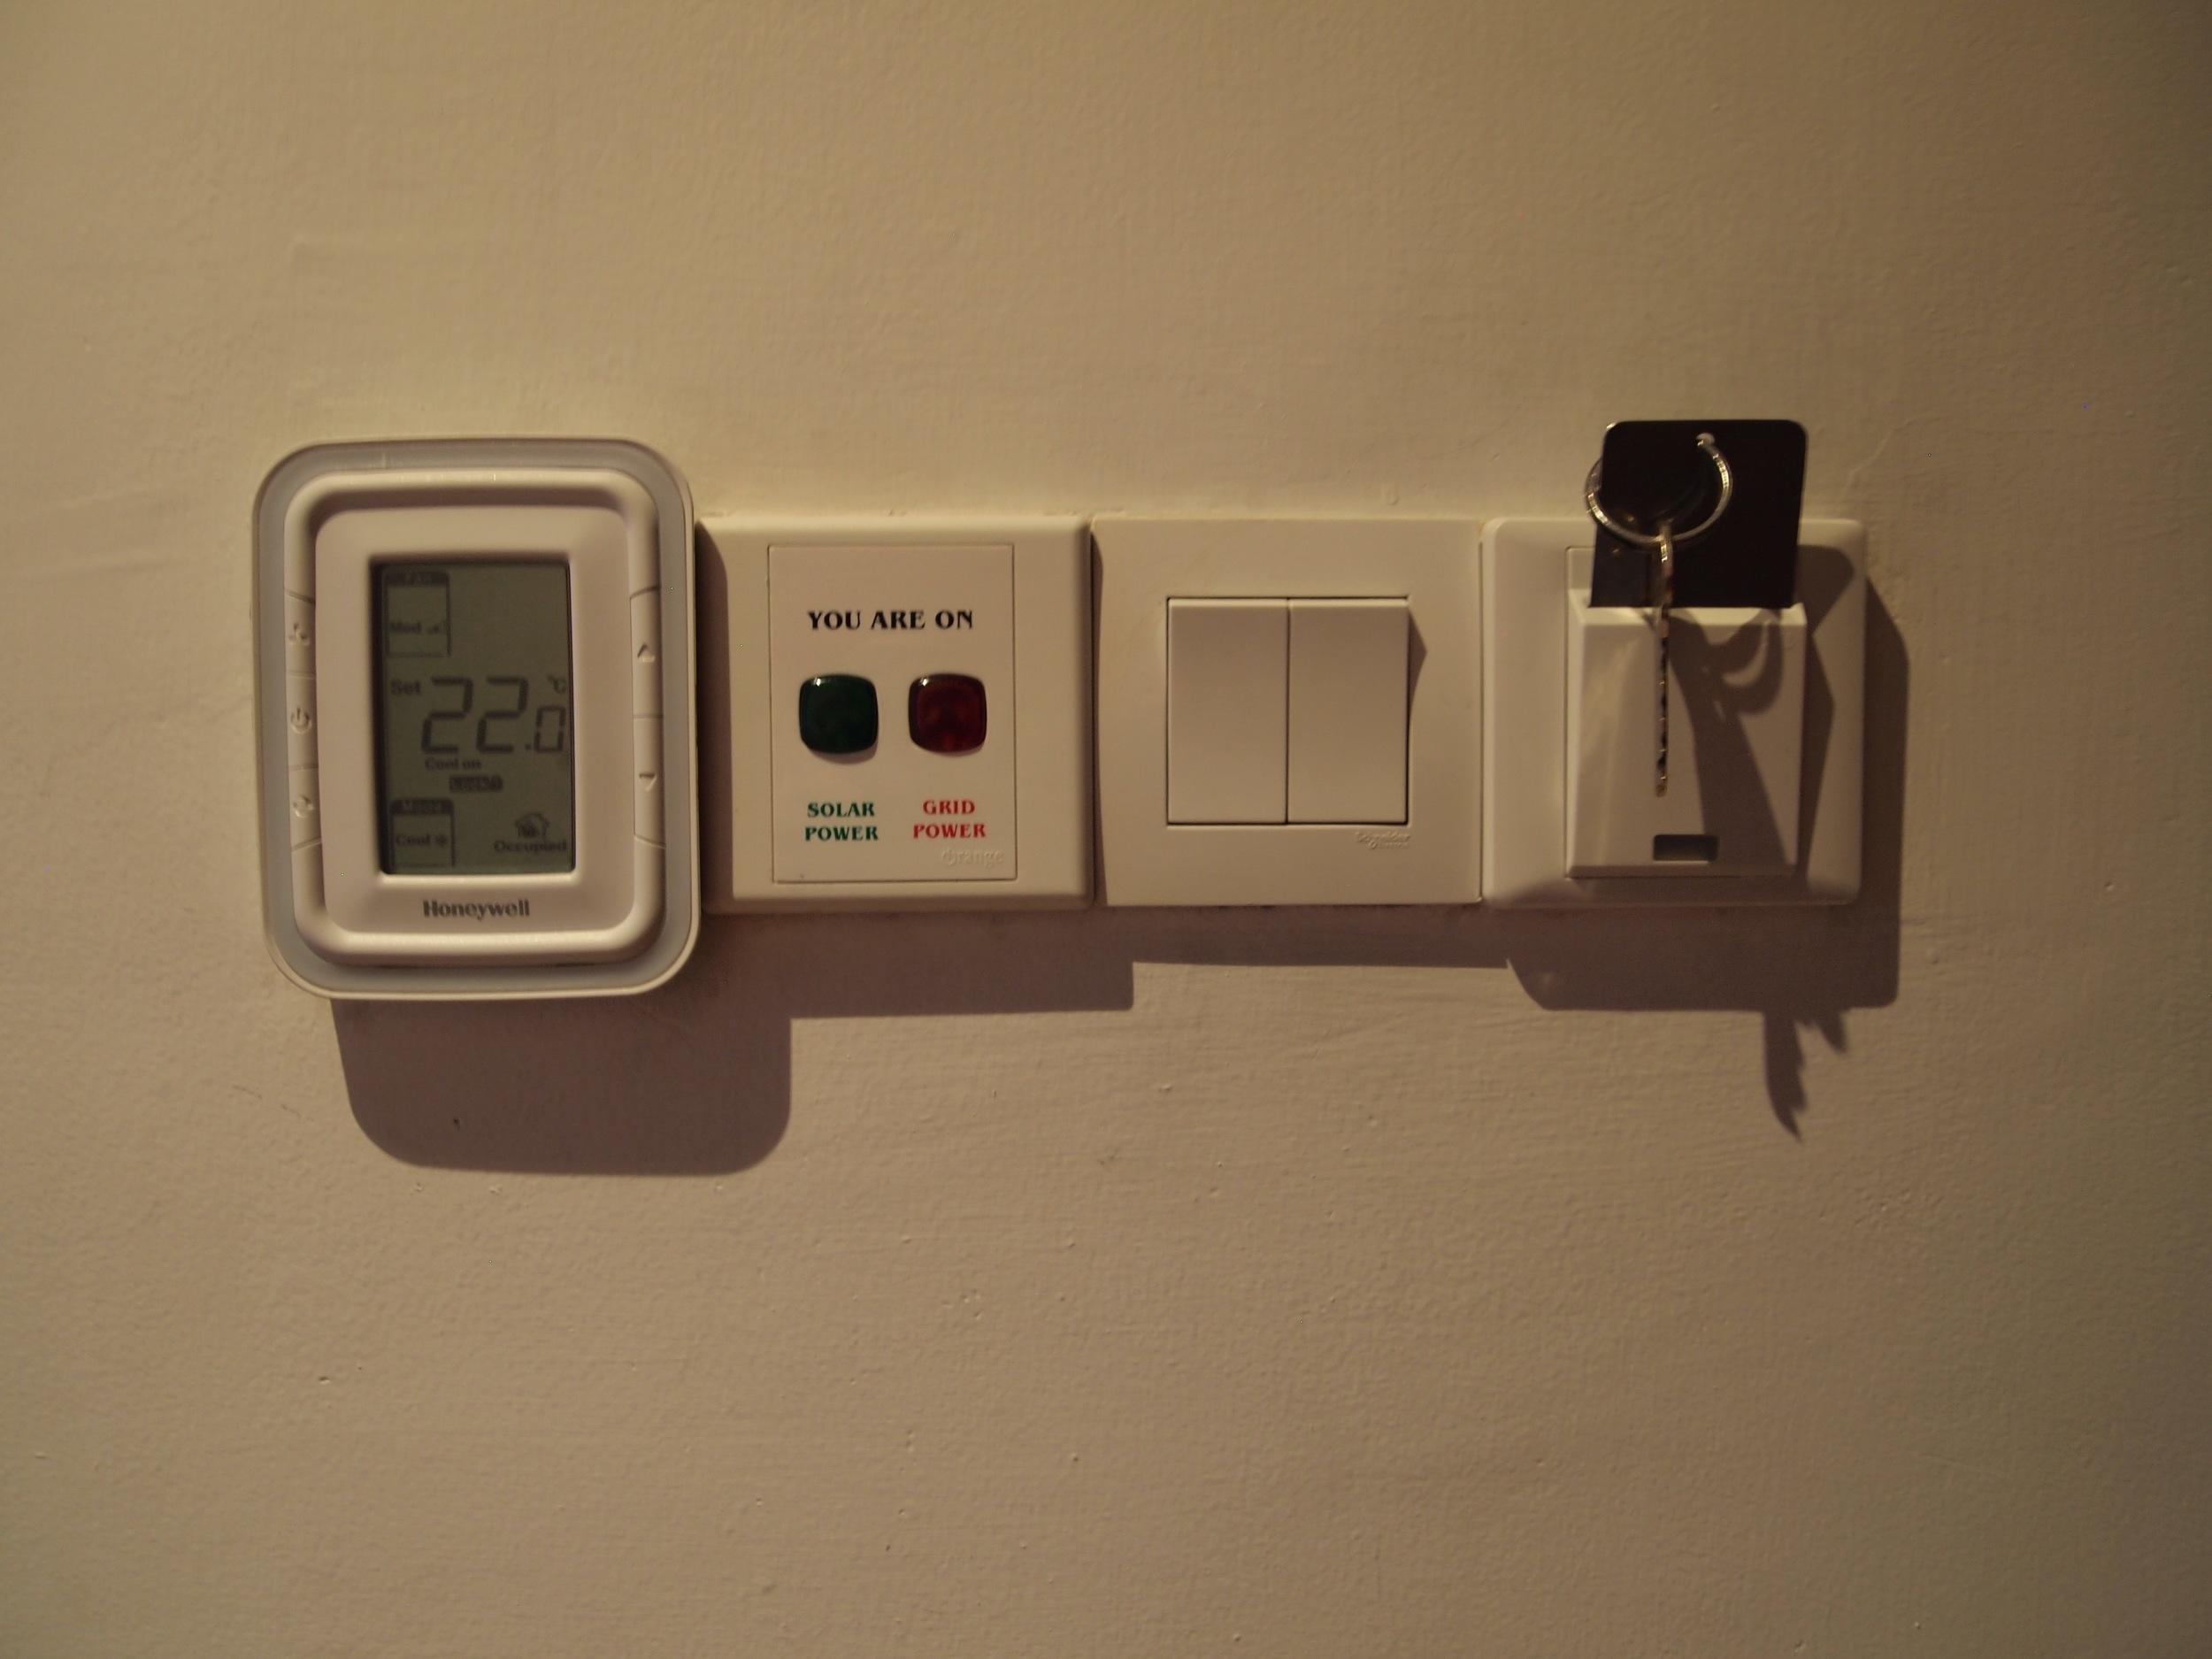 Energy efficiency = solar